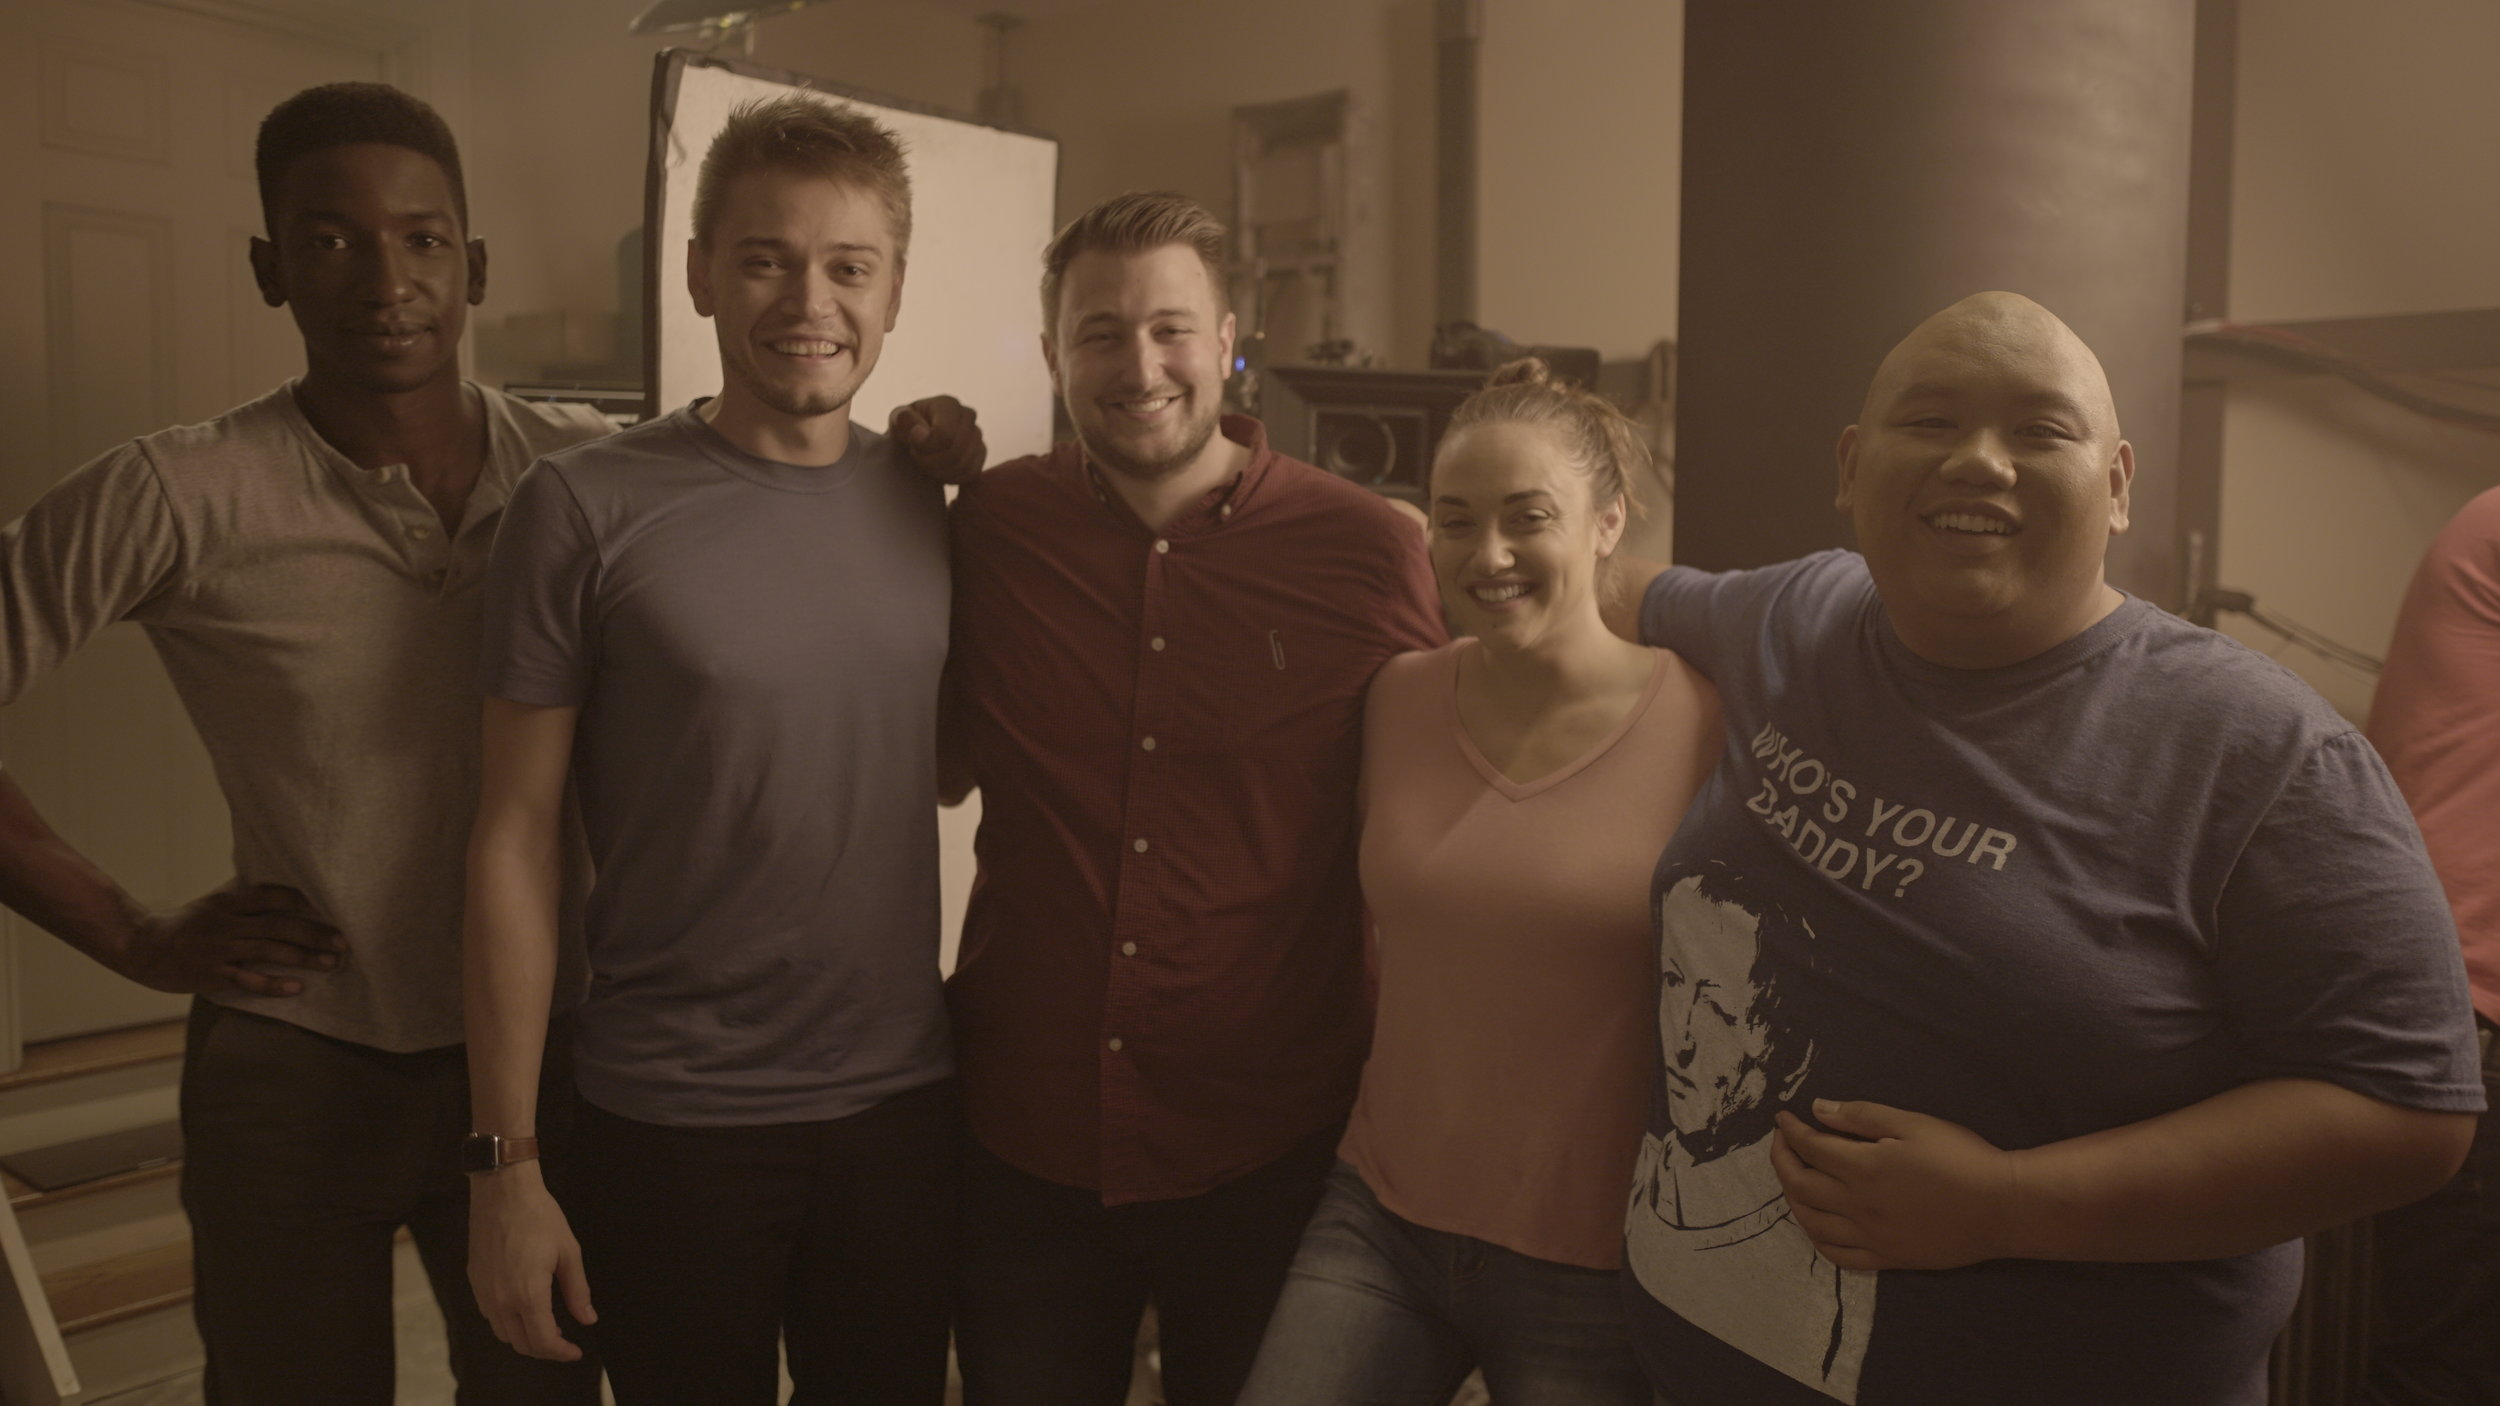 Mamoudou Athie (NATE), Michael Koehler (the Writer), Noah Wagner (director), Alice Kremelberg (CHLOE) and Jacob Batalon (BERNARD)